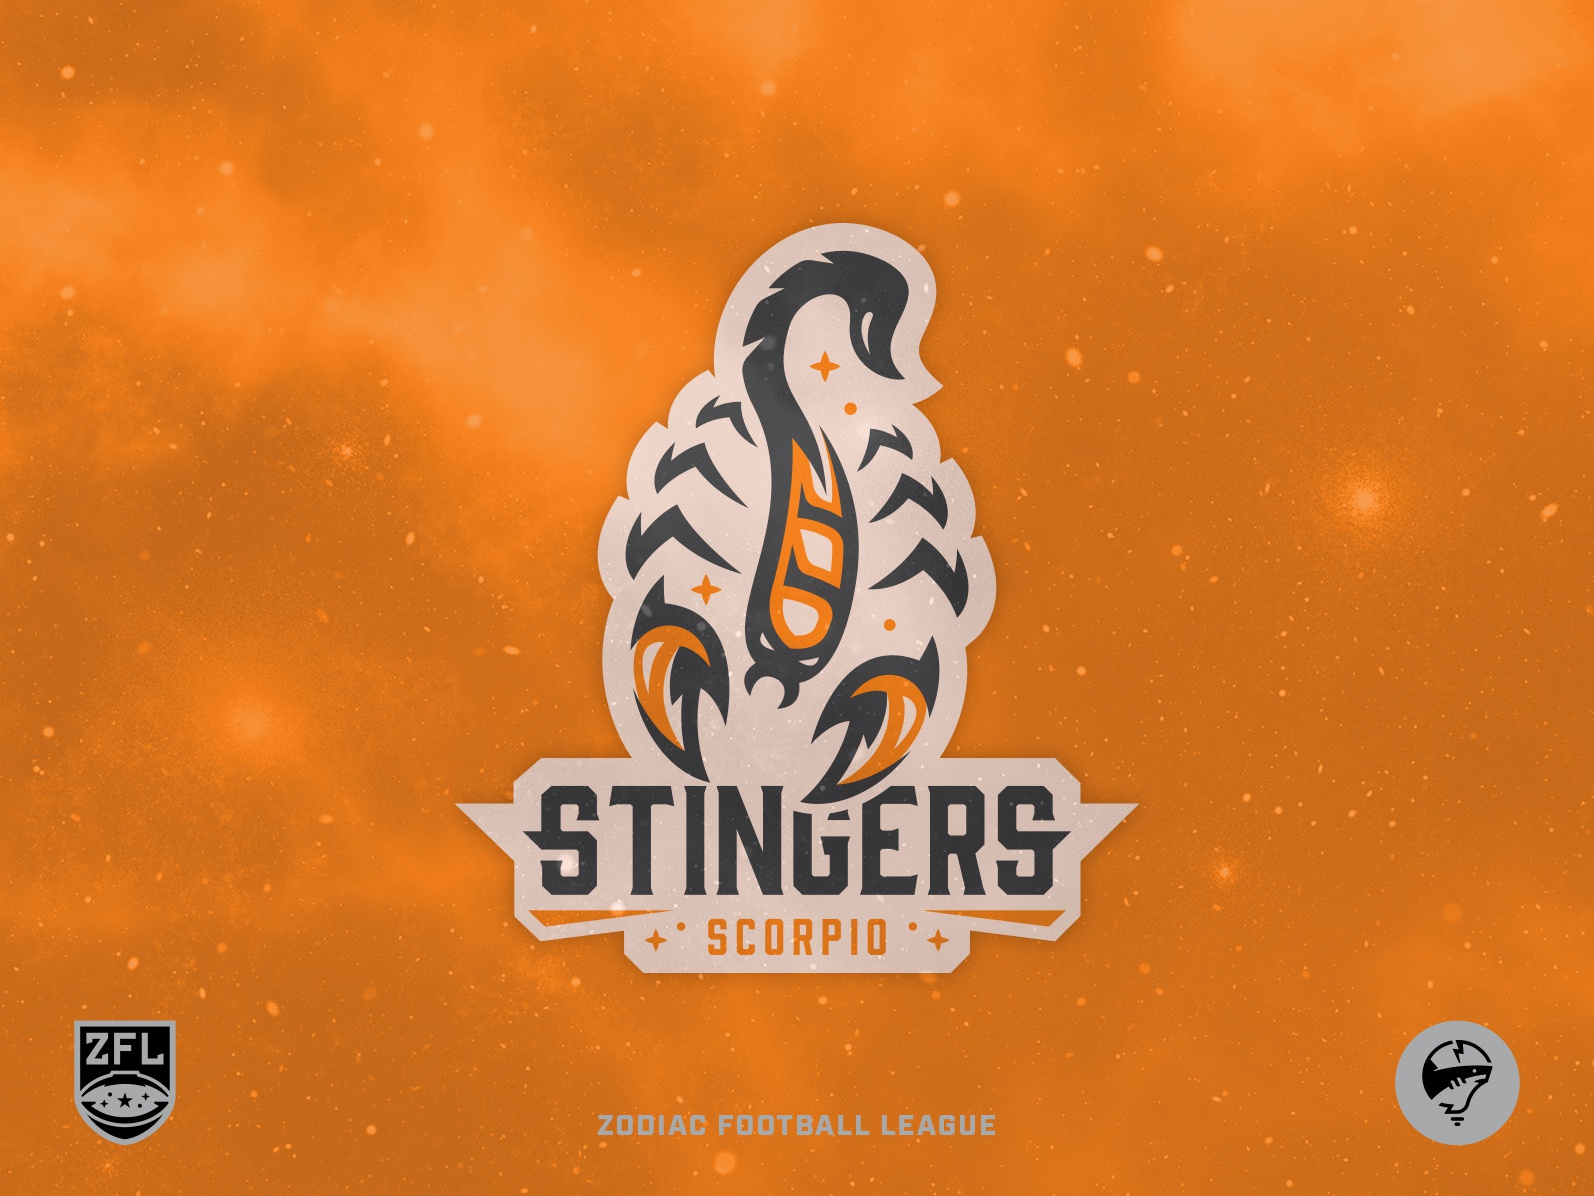 ZFL | Scorpio Stingers Primary 2.0 orange bold illustration vector astrology wordmark dribbble identity branding league football zodiac sports logo sports branding logo design logo crest badge scorpion scorpio